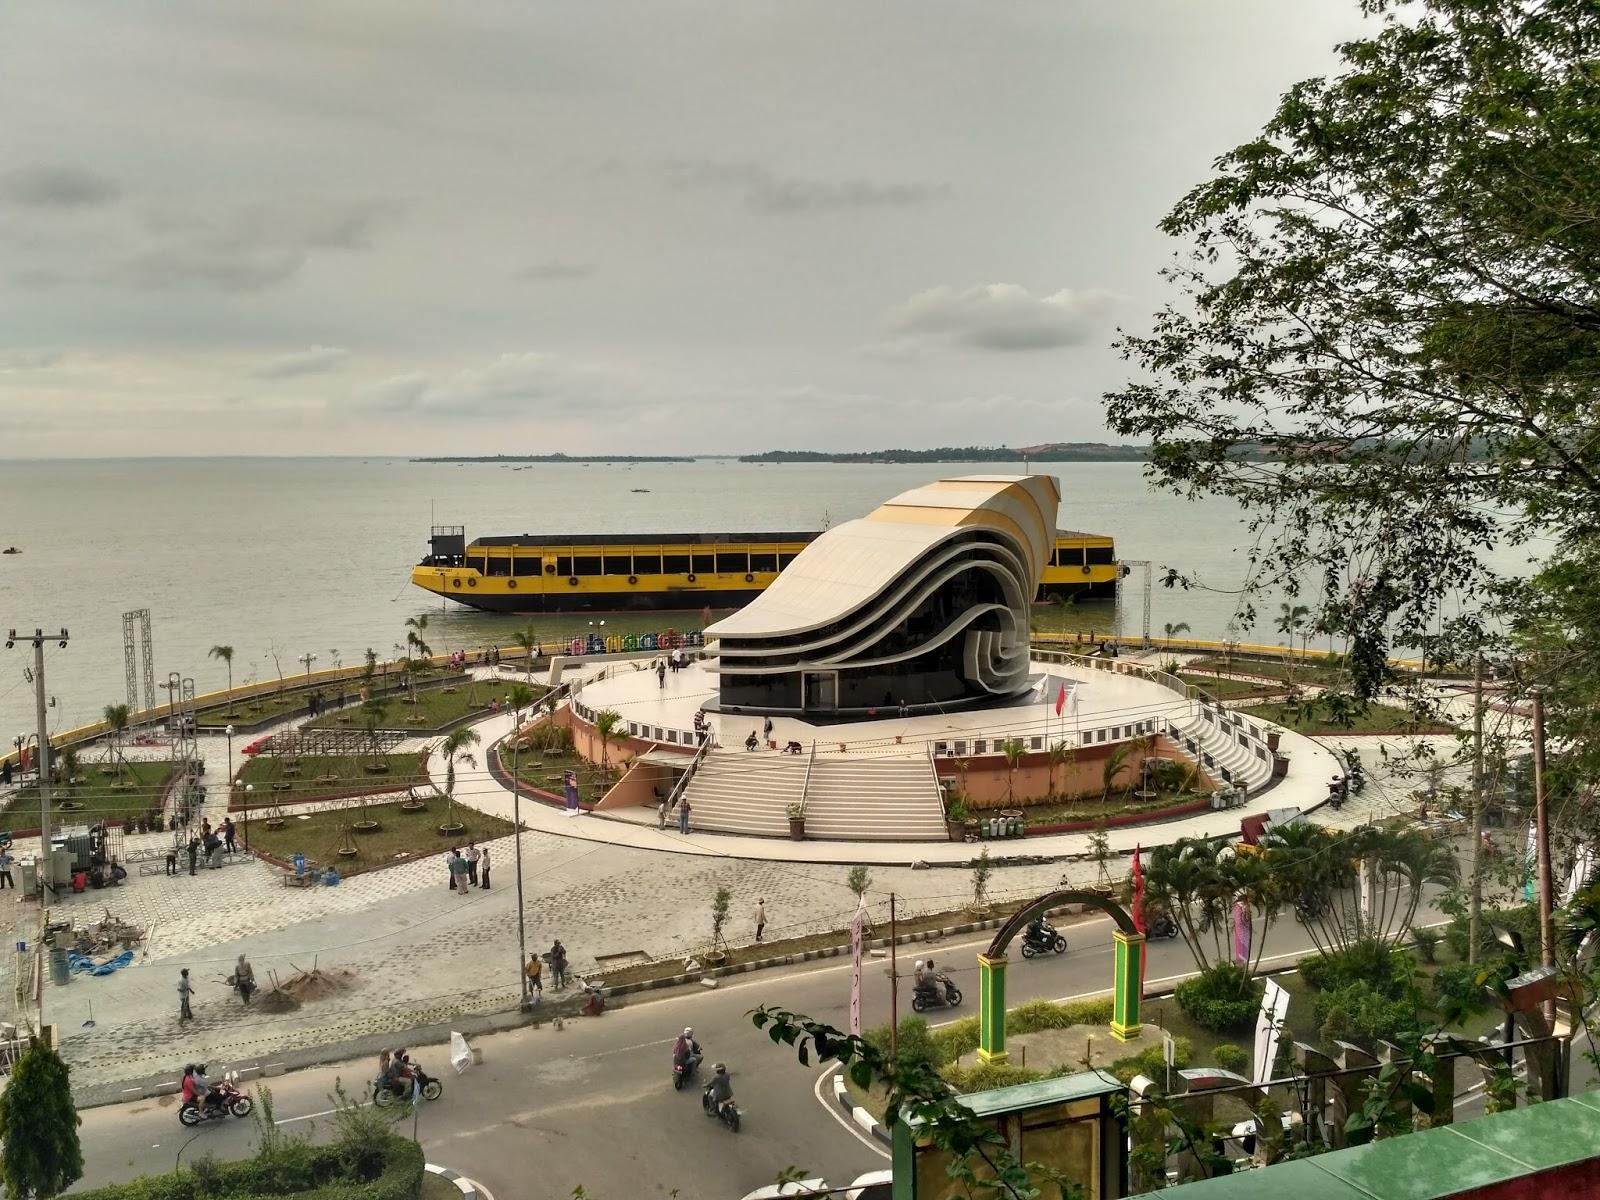 Festival Bahari Kepri 2016 Bertabur Acara Hari Puncak Sabtu Minggu